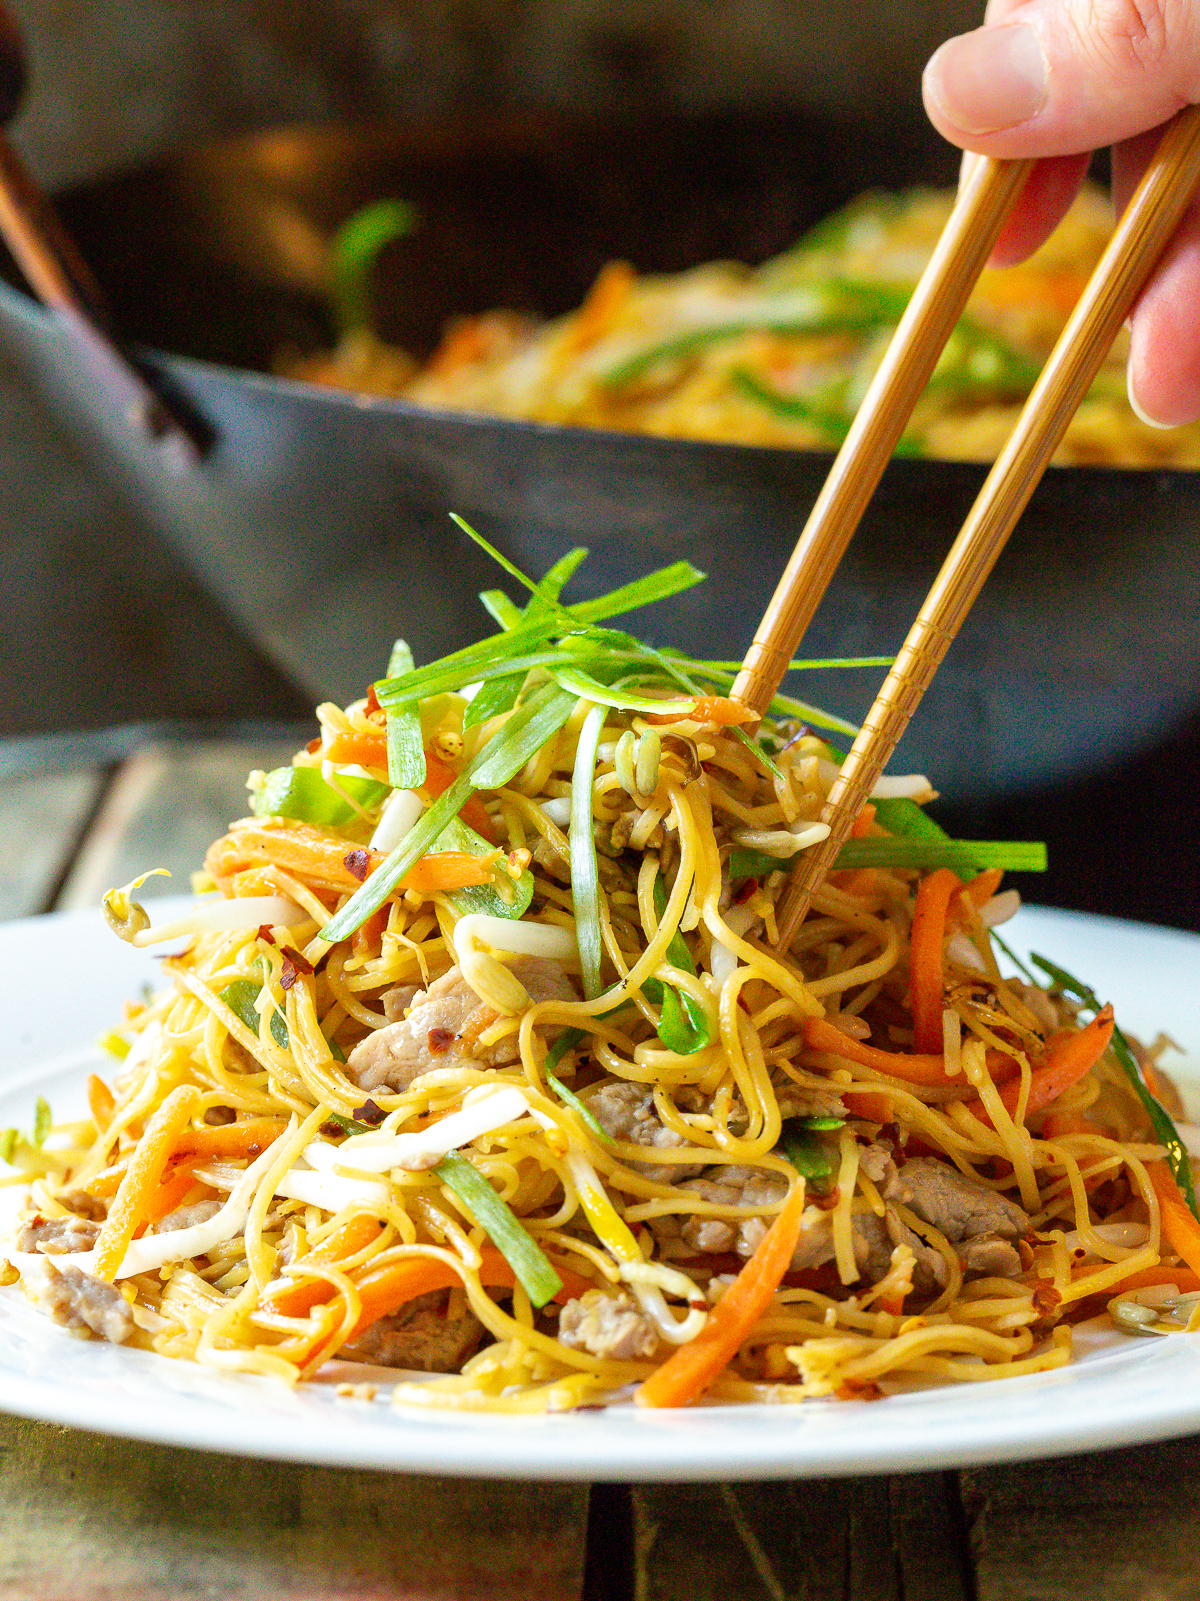 Easy Cantonese Pan Fried Noodles (Pork Lo Mein)